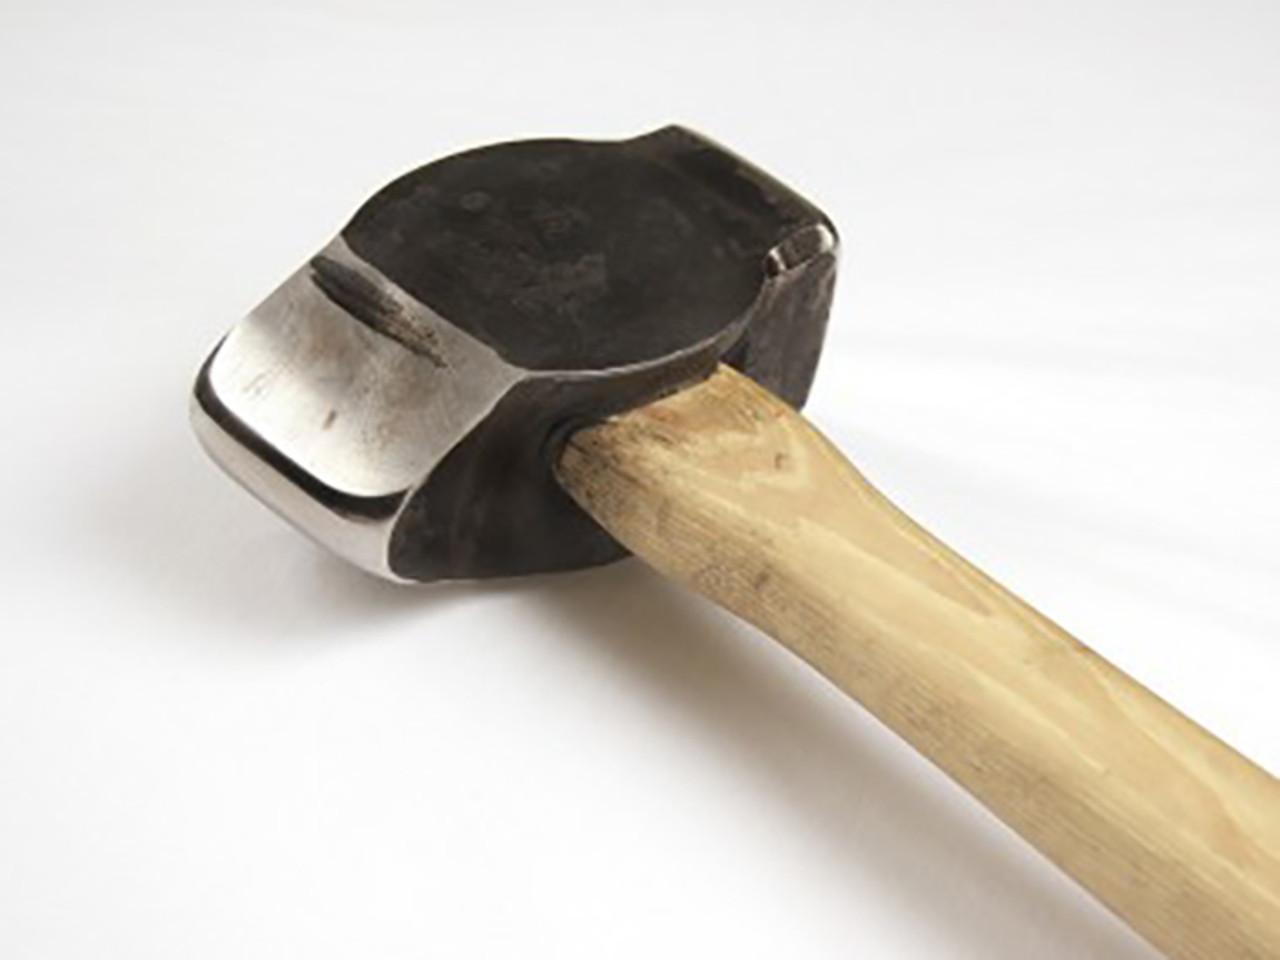 Big Blu 2.6 lb. Straight Pein Hammer, Hand-Forged, wood handle.